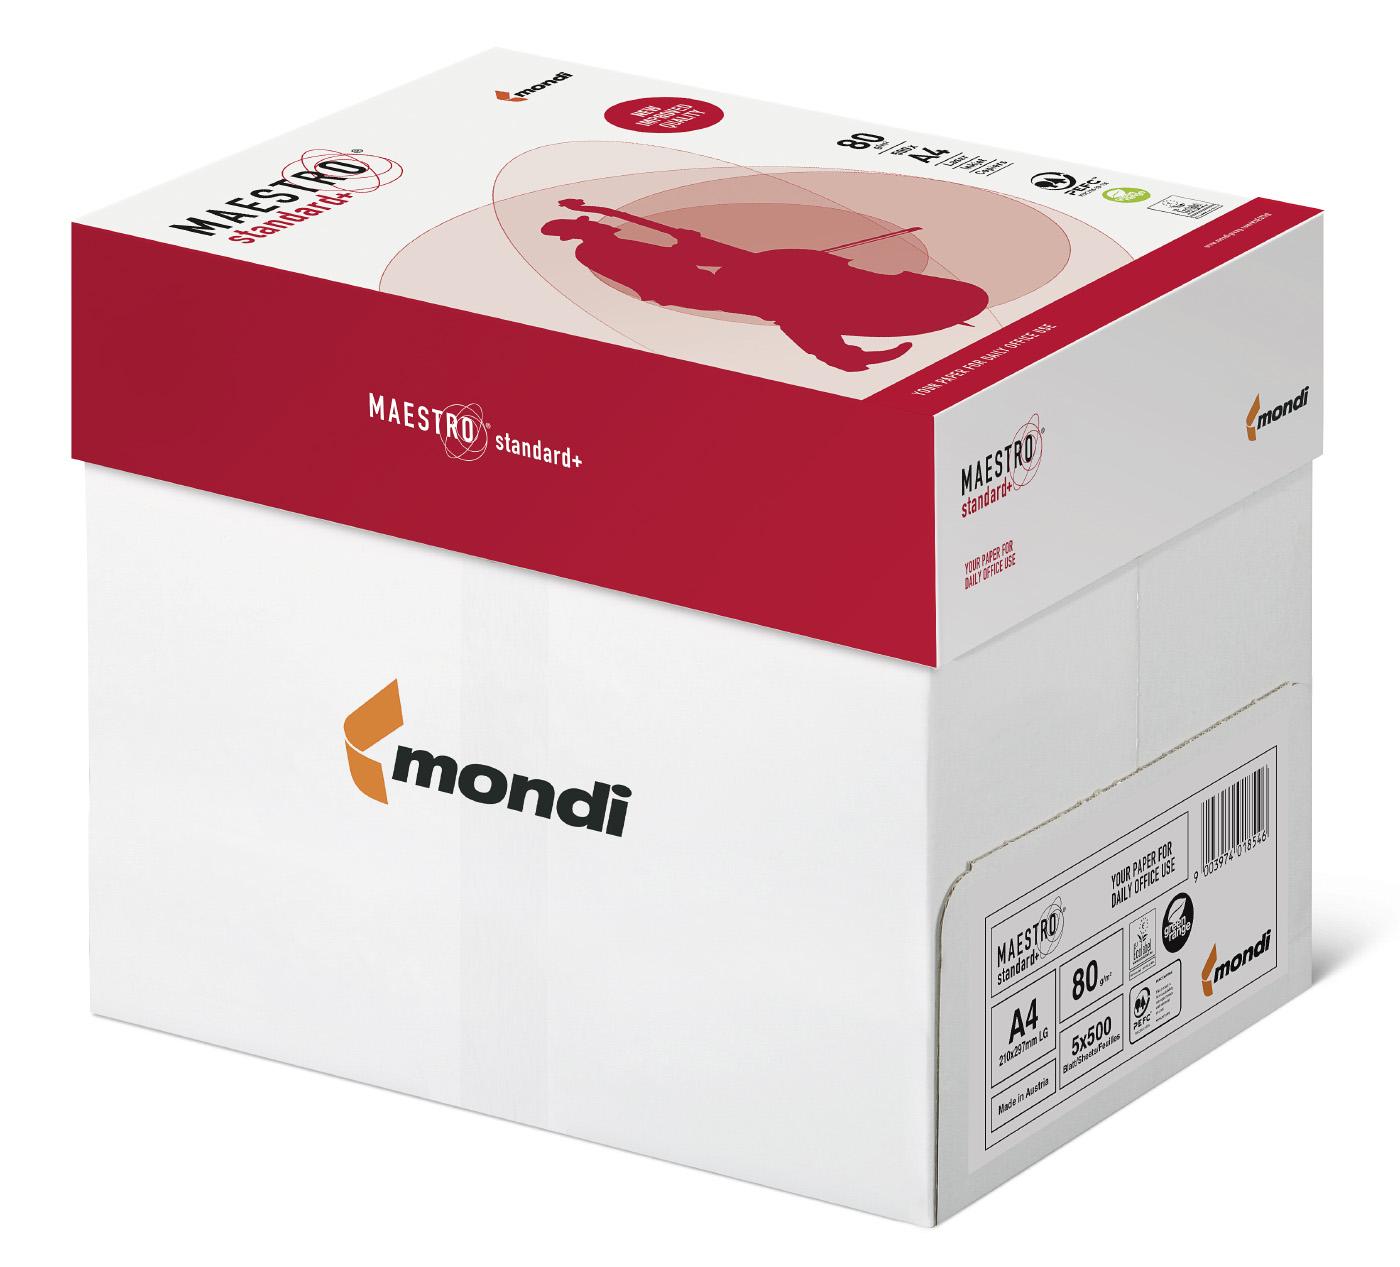 Бумага А4 80гр./м2. 500 листов Maestro Standard Plus Mondi - фото 3